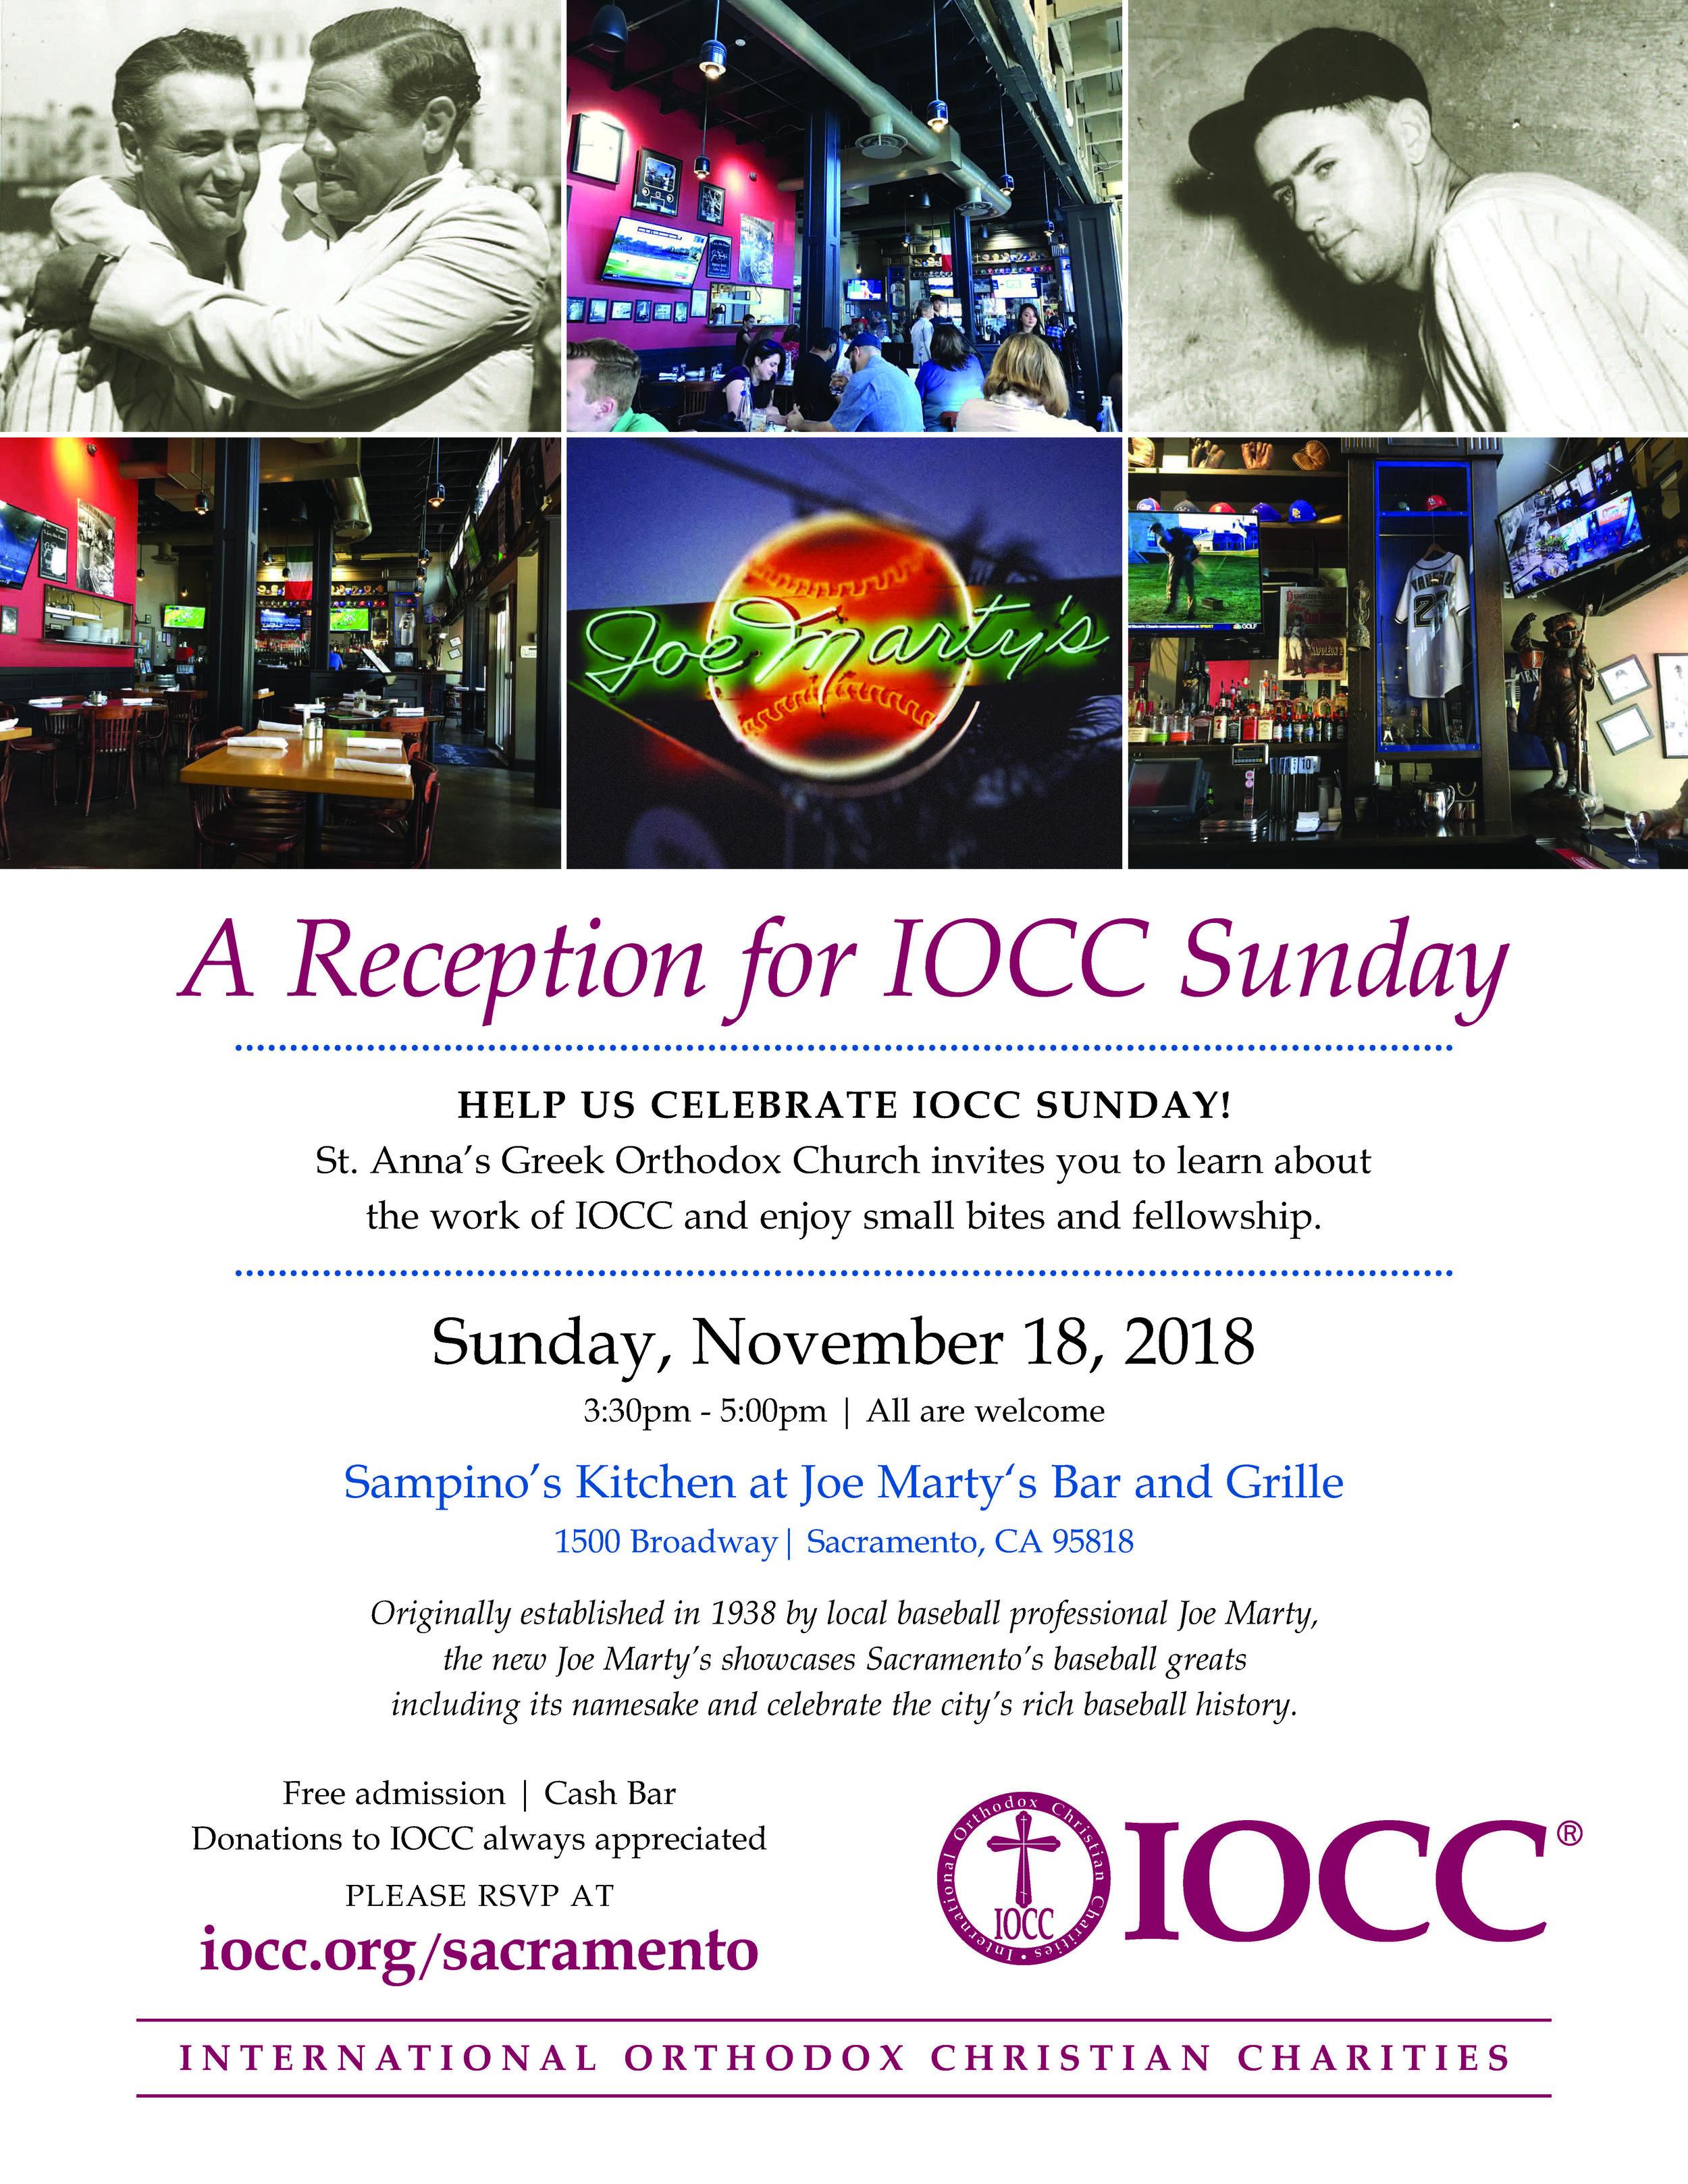 IOCC Sacramento.jpg